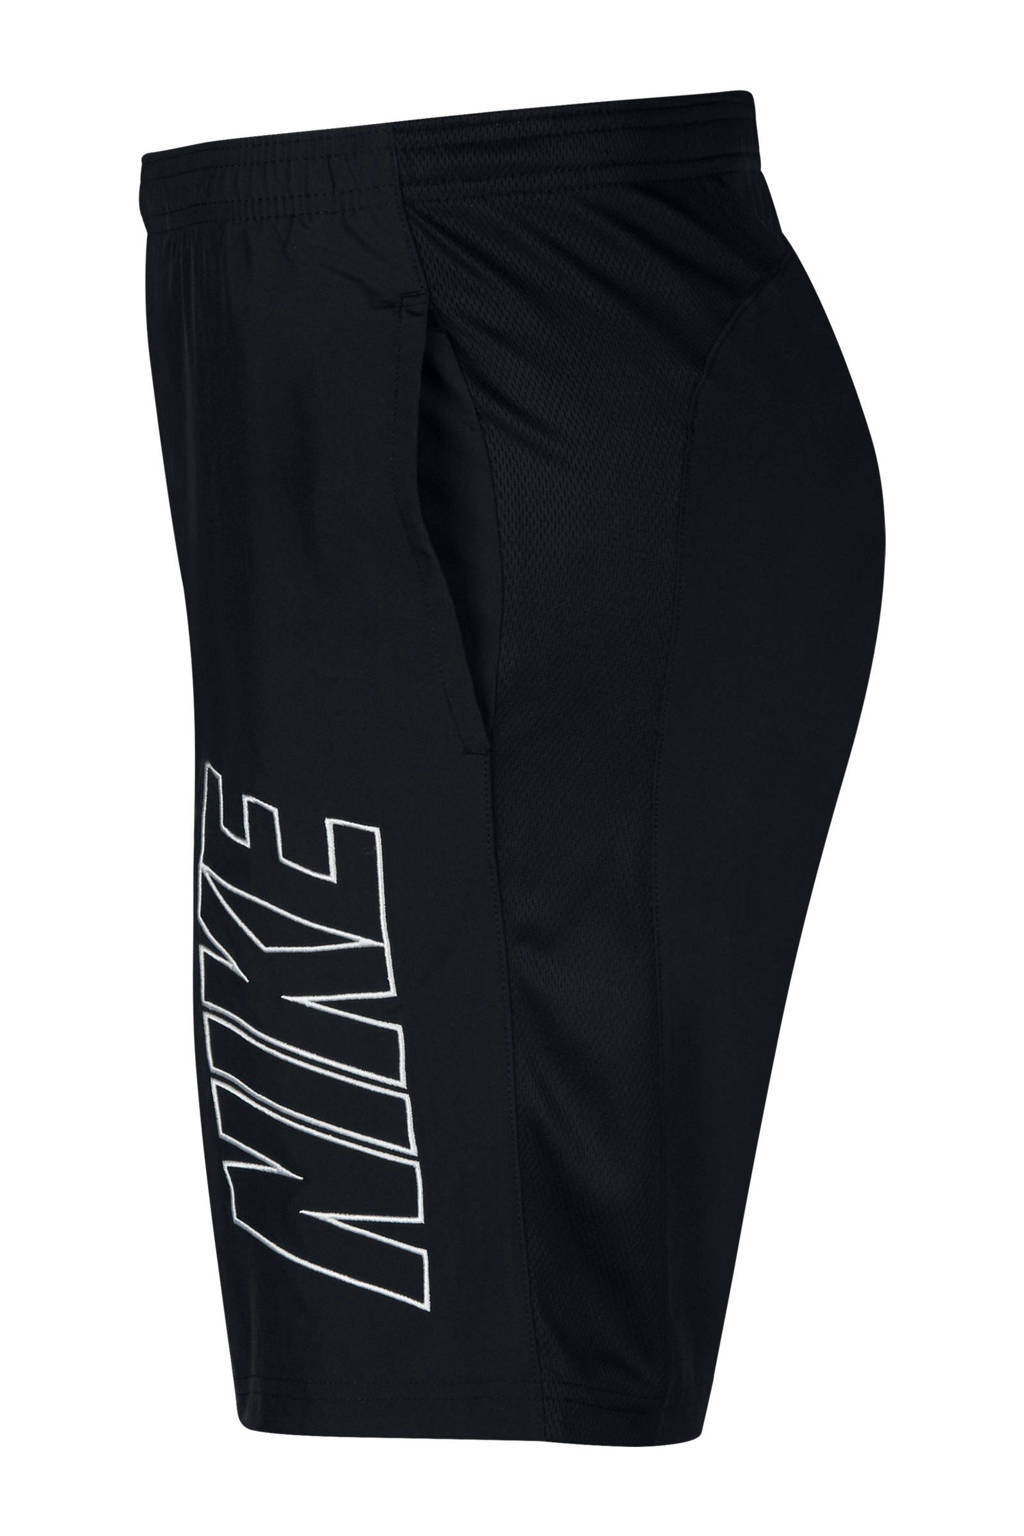 Nike   voetbalshort zwart, Zwart